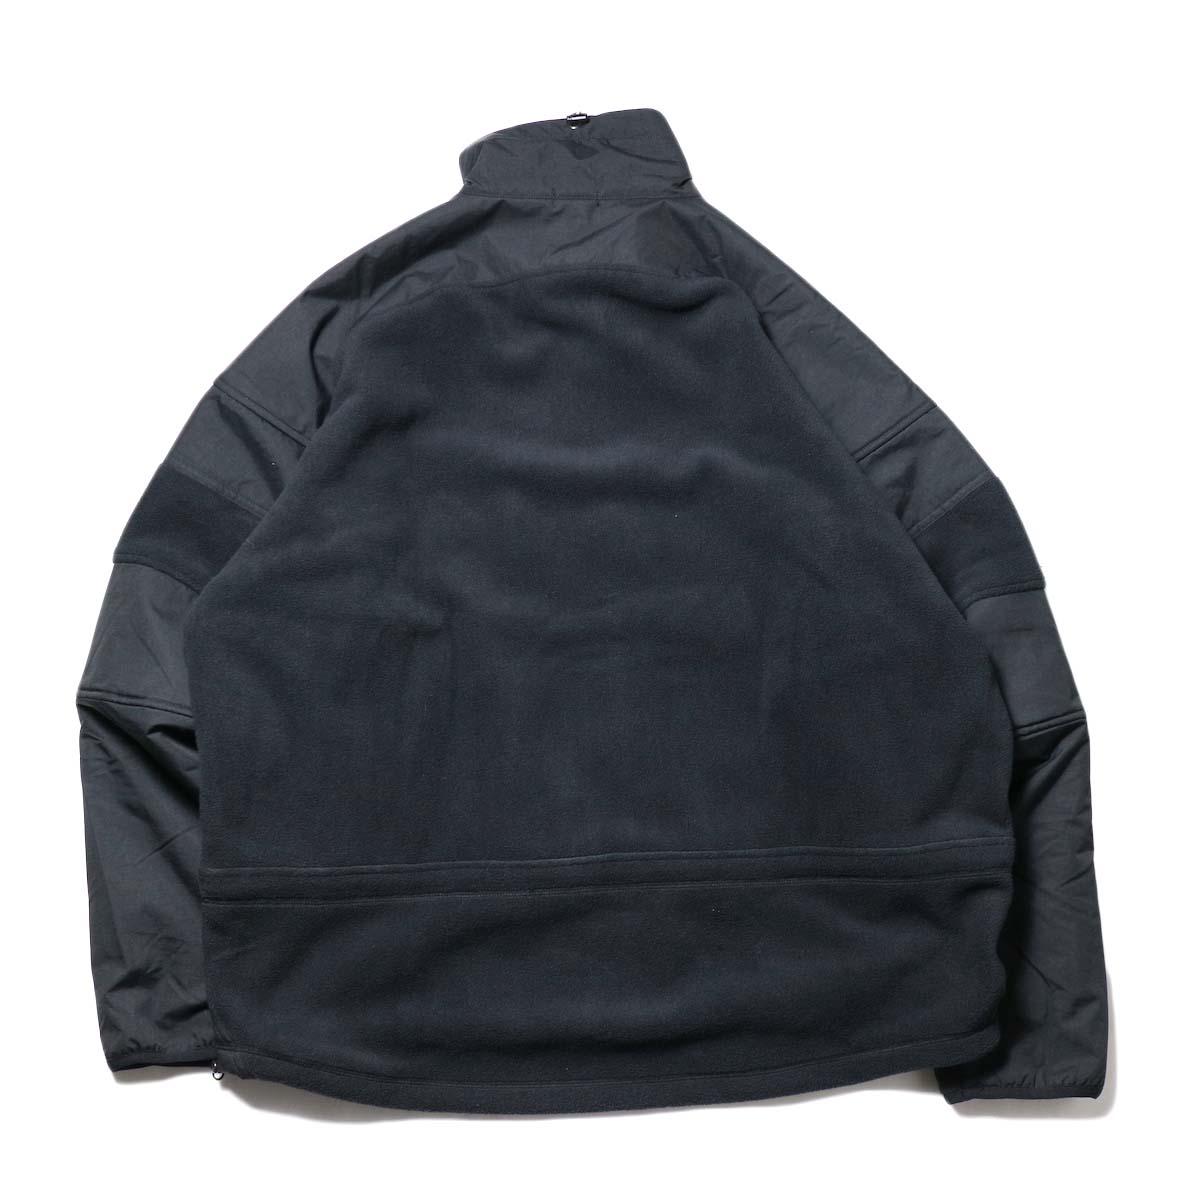 Marmot Histric Collection / Alpinist Tech Sweater (Black×Black)背面